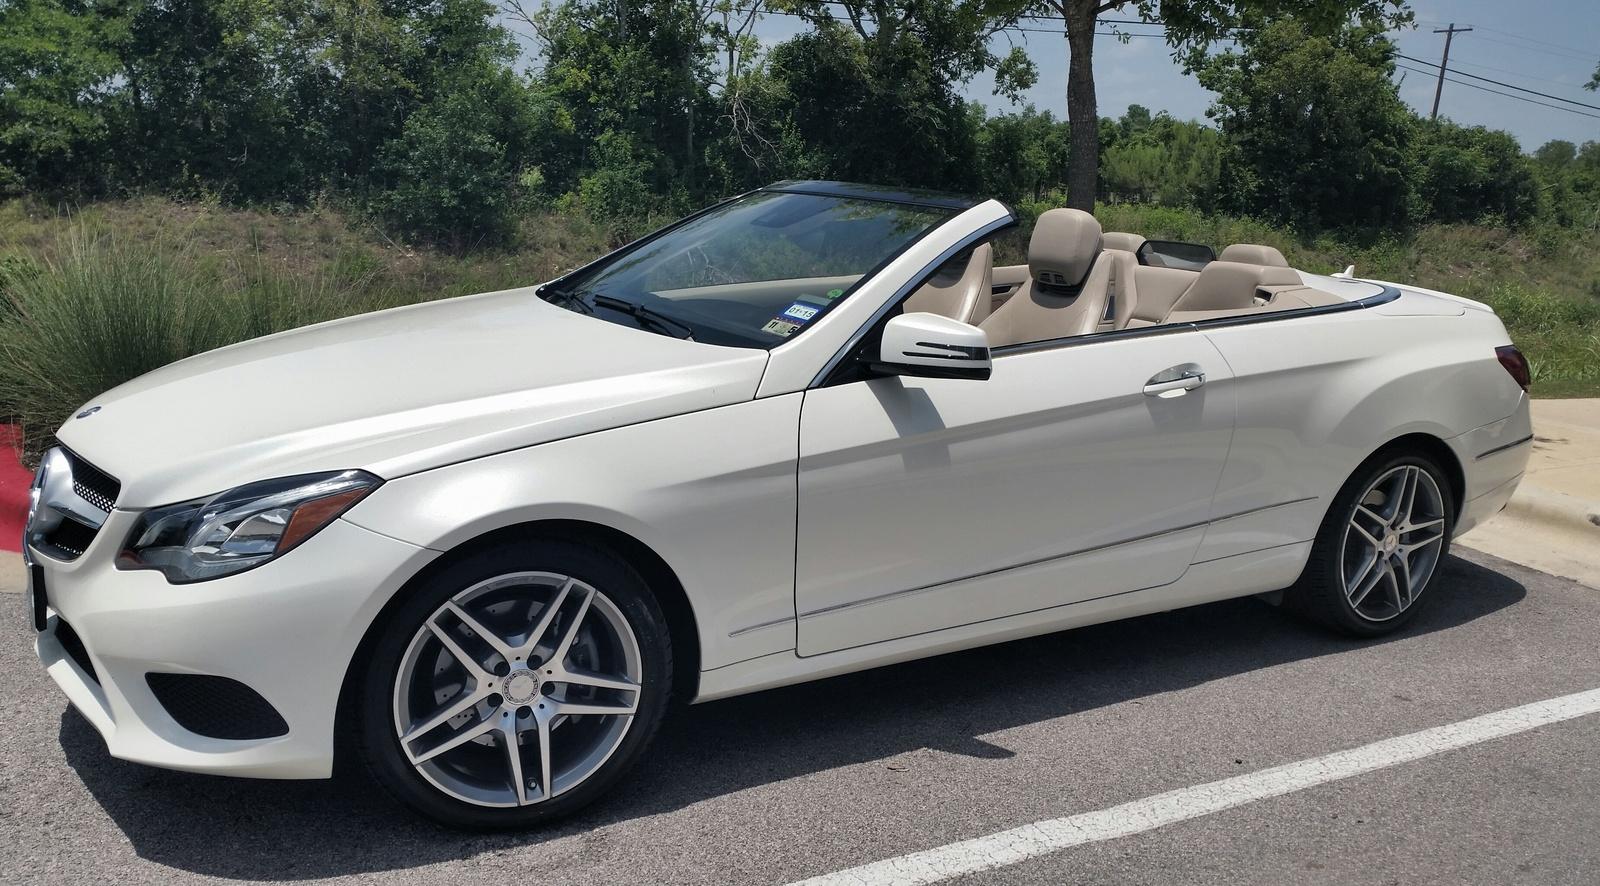 2014 mercedes benz e class pictures cargurus for Mercedes benz convertible 2014